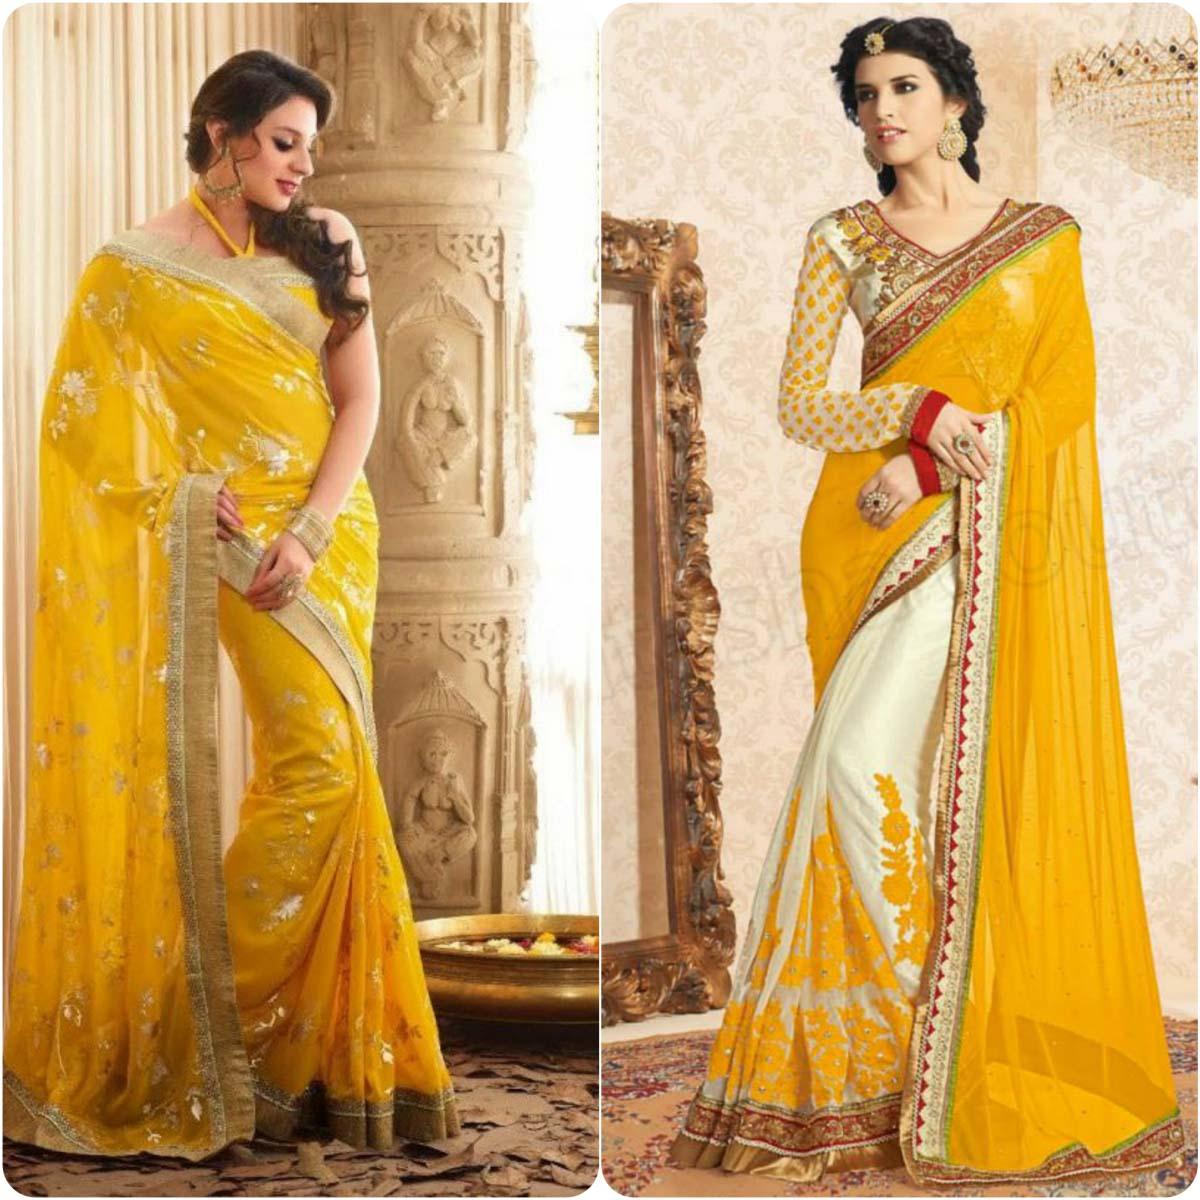 Beautiful Yellow Mehndi Dresses for Wedding Brides 2016-2017 (12)